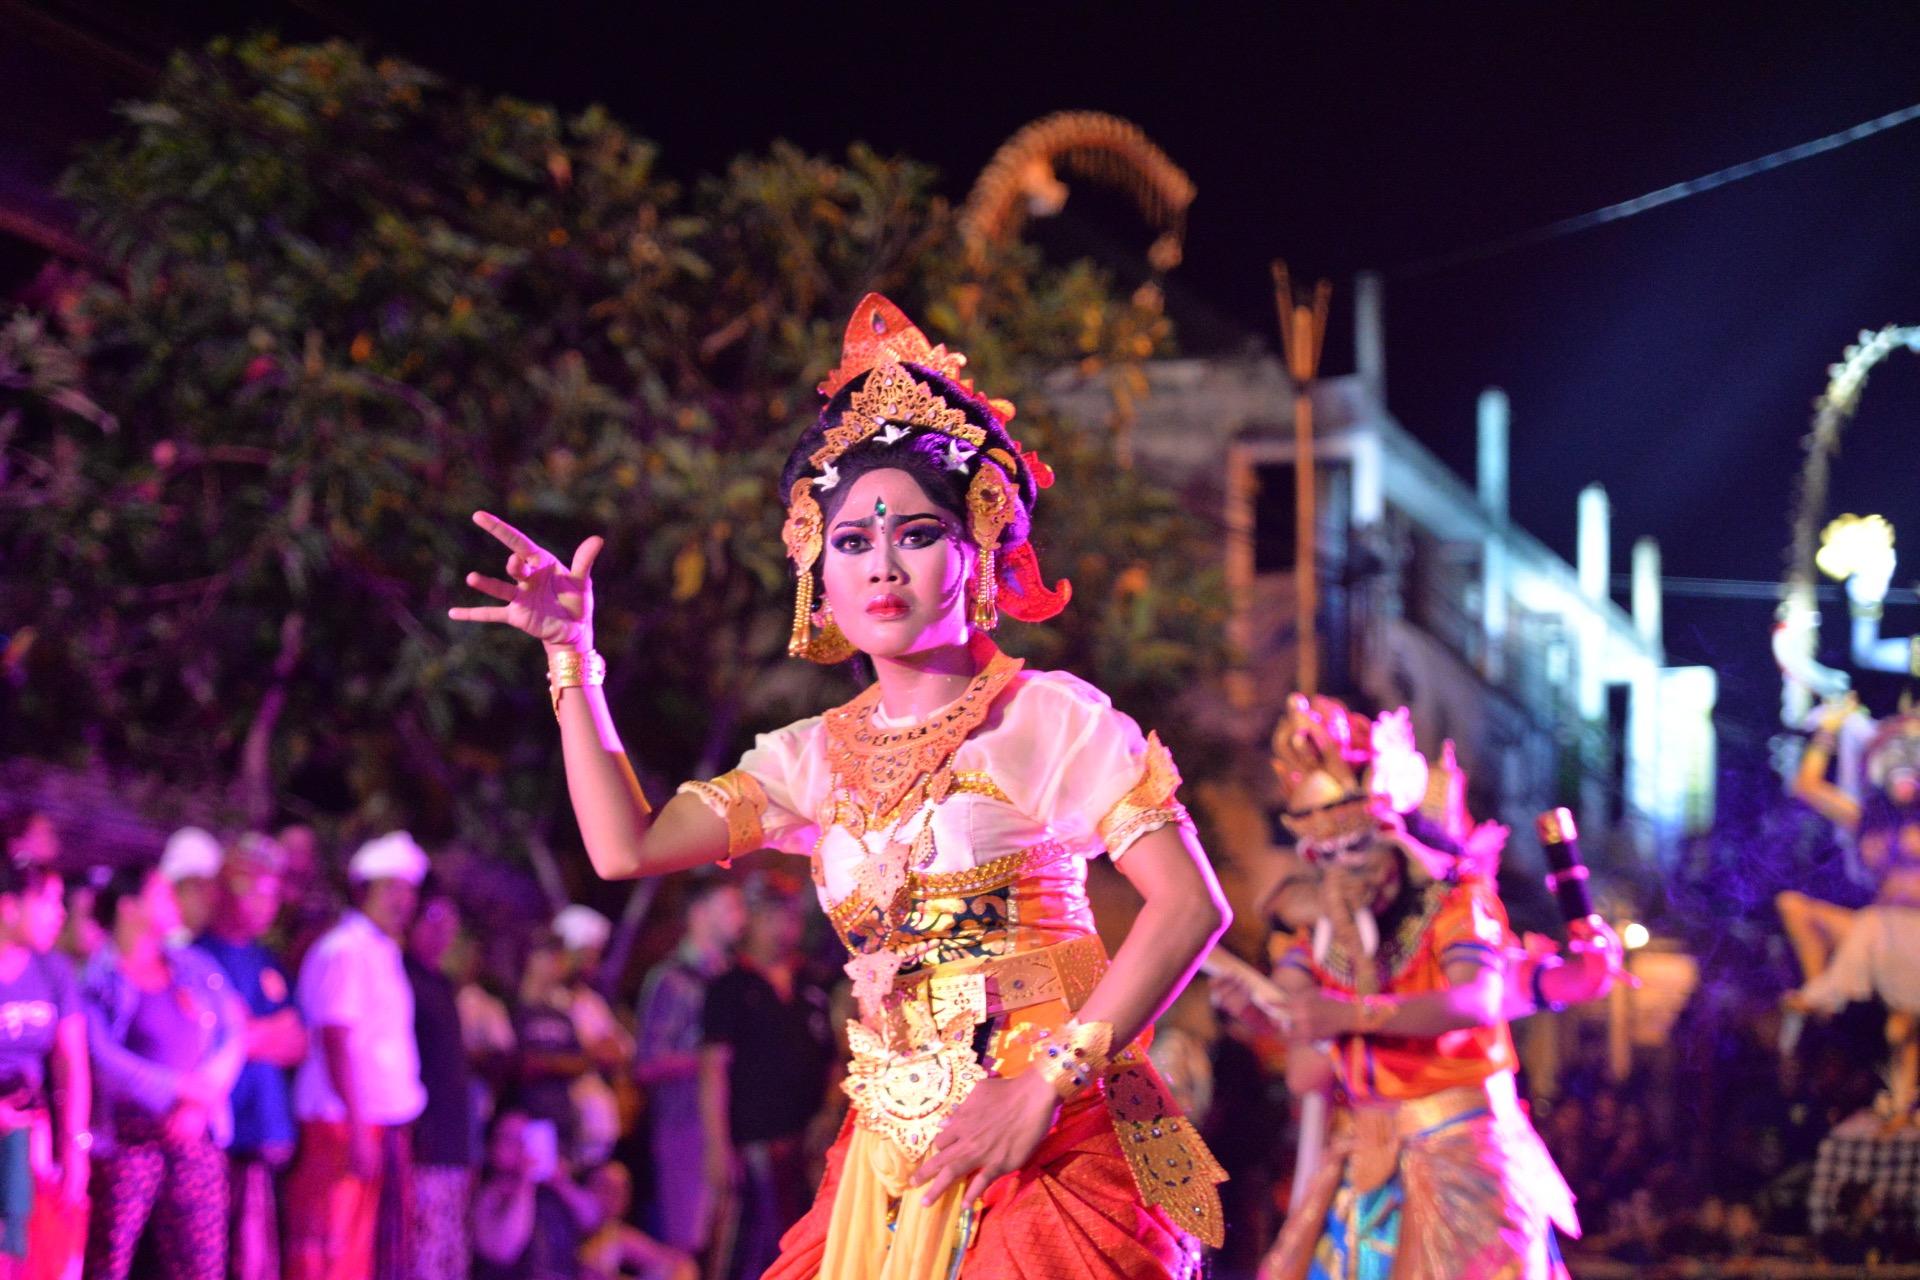 A traditional Kecak dance awaits in the Kingdom of Ubud